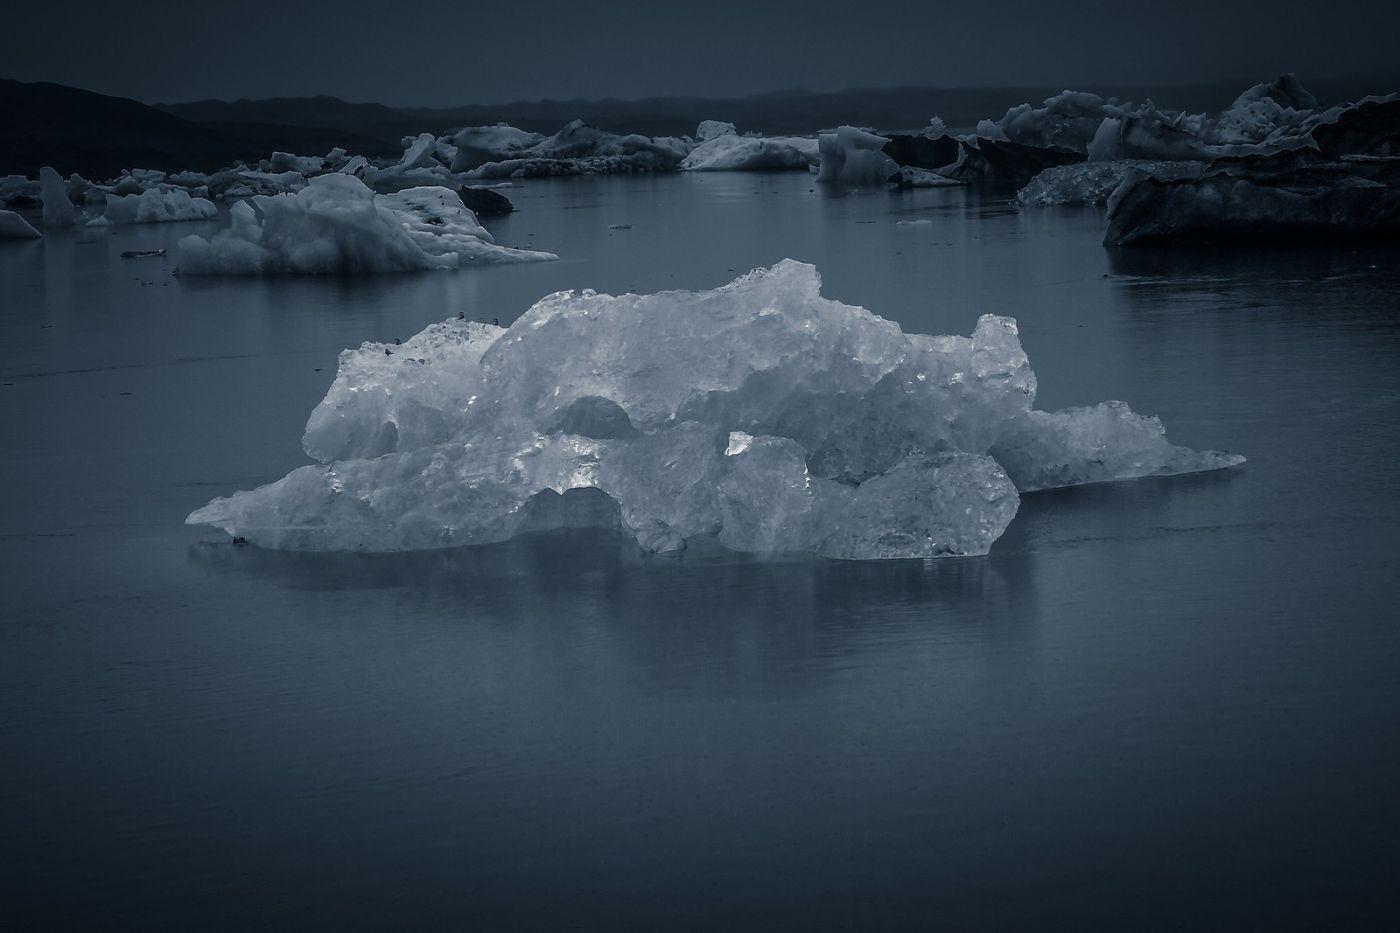 冰岛冰川泻湖(Glacier Lagoon),流动的冰川_图1-21